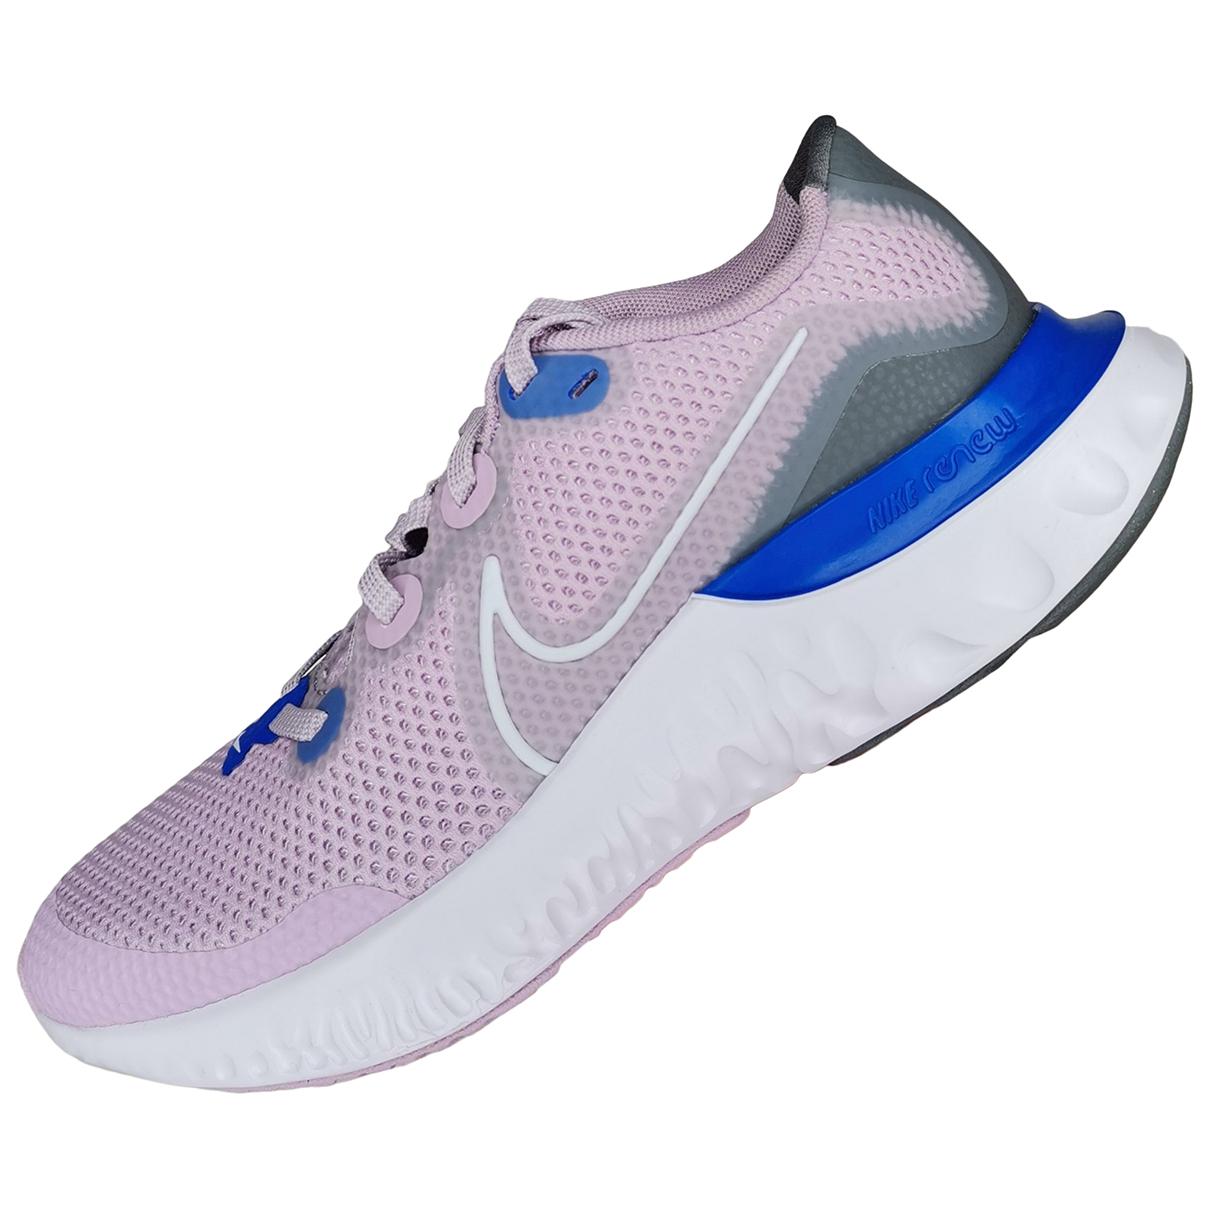 Nike N Pink Cloth Trainers for Women 36.5 EU